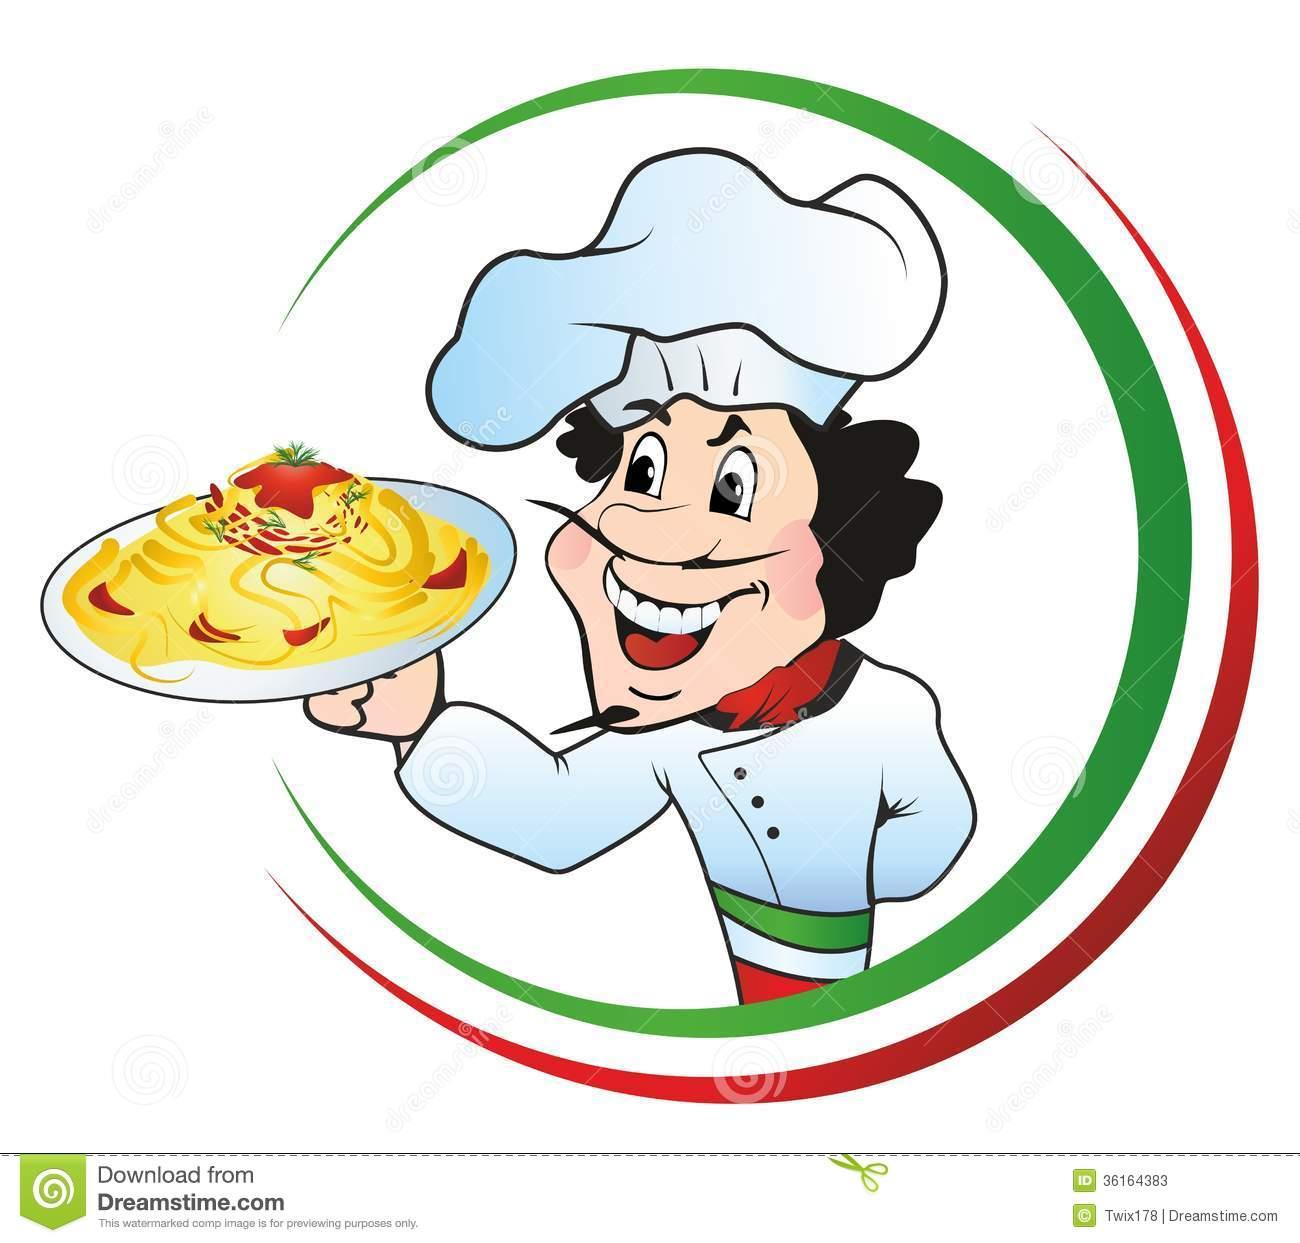 Spaghetti clipart italian person Clipart Art Panda Free Free